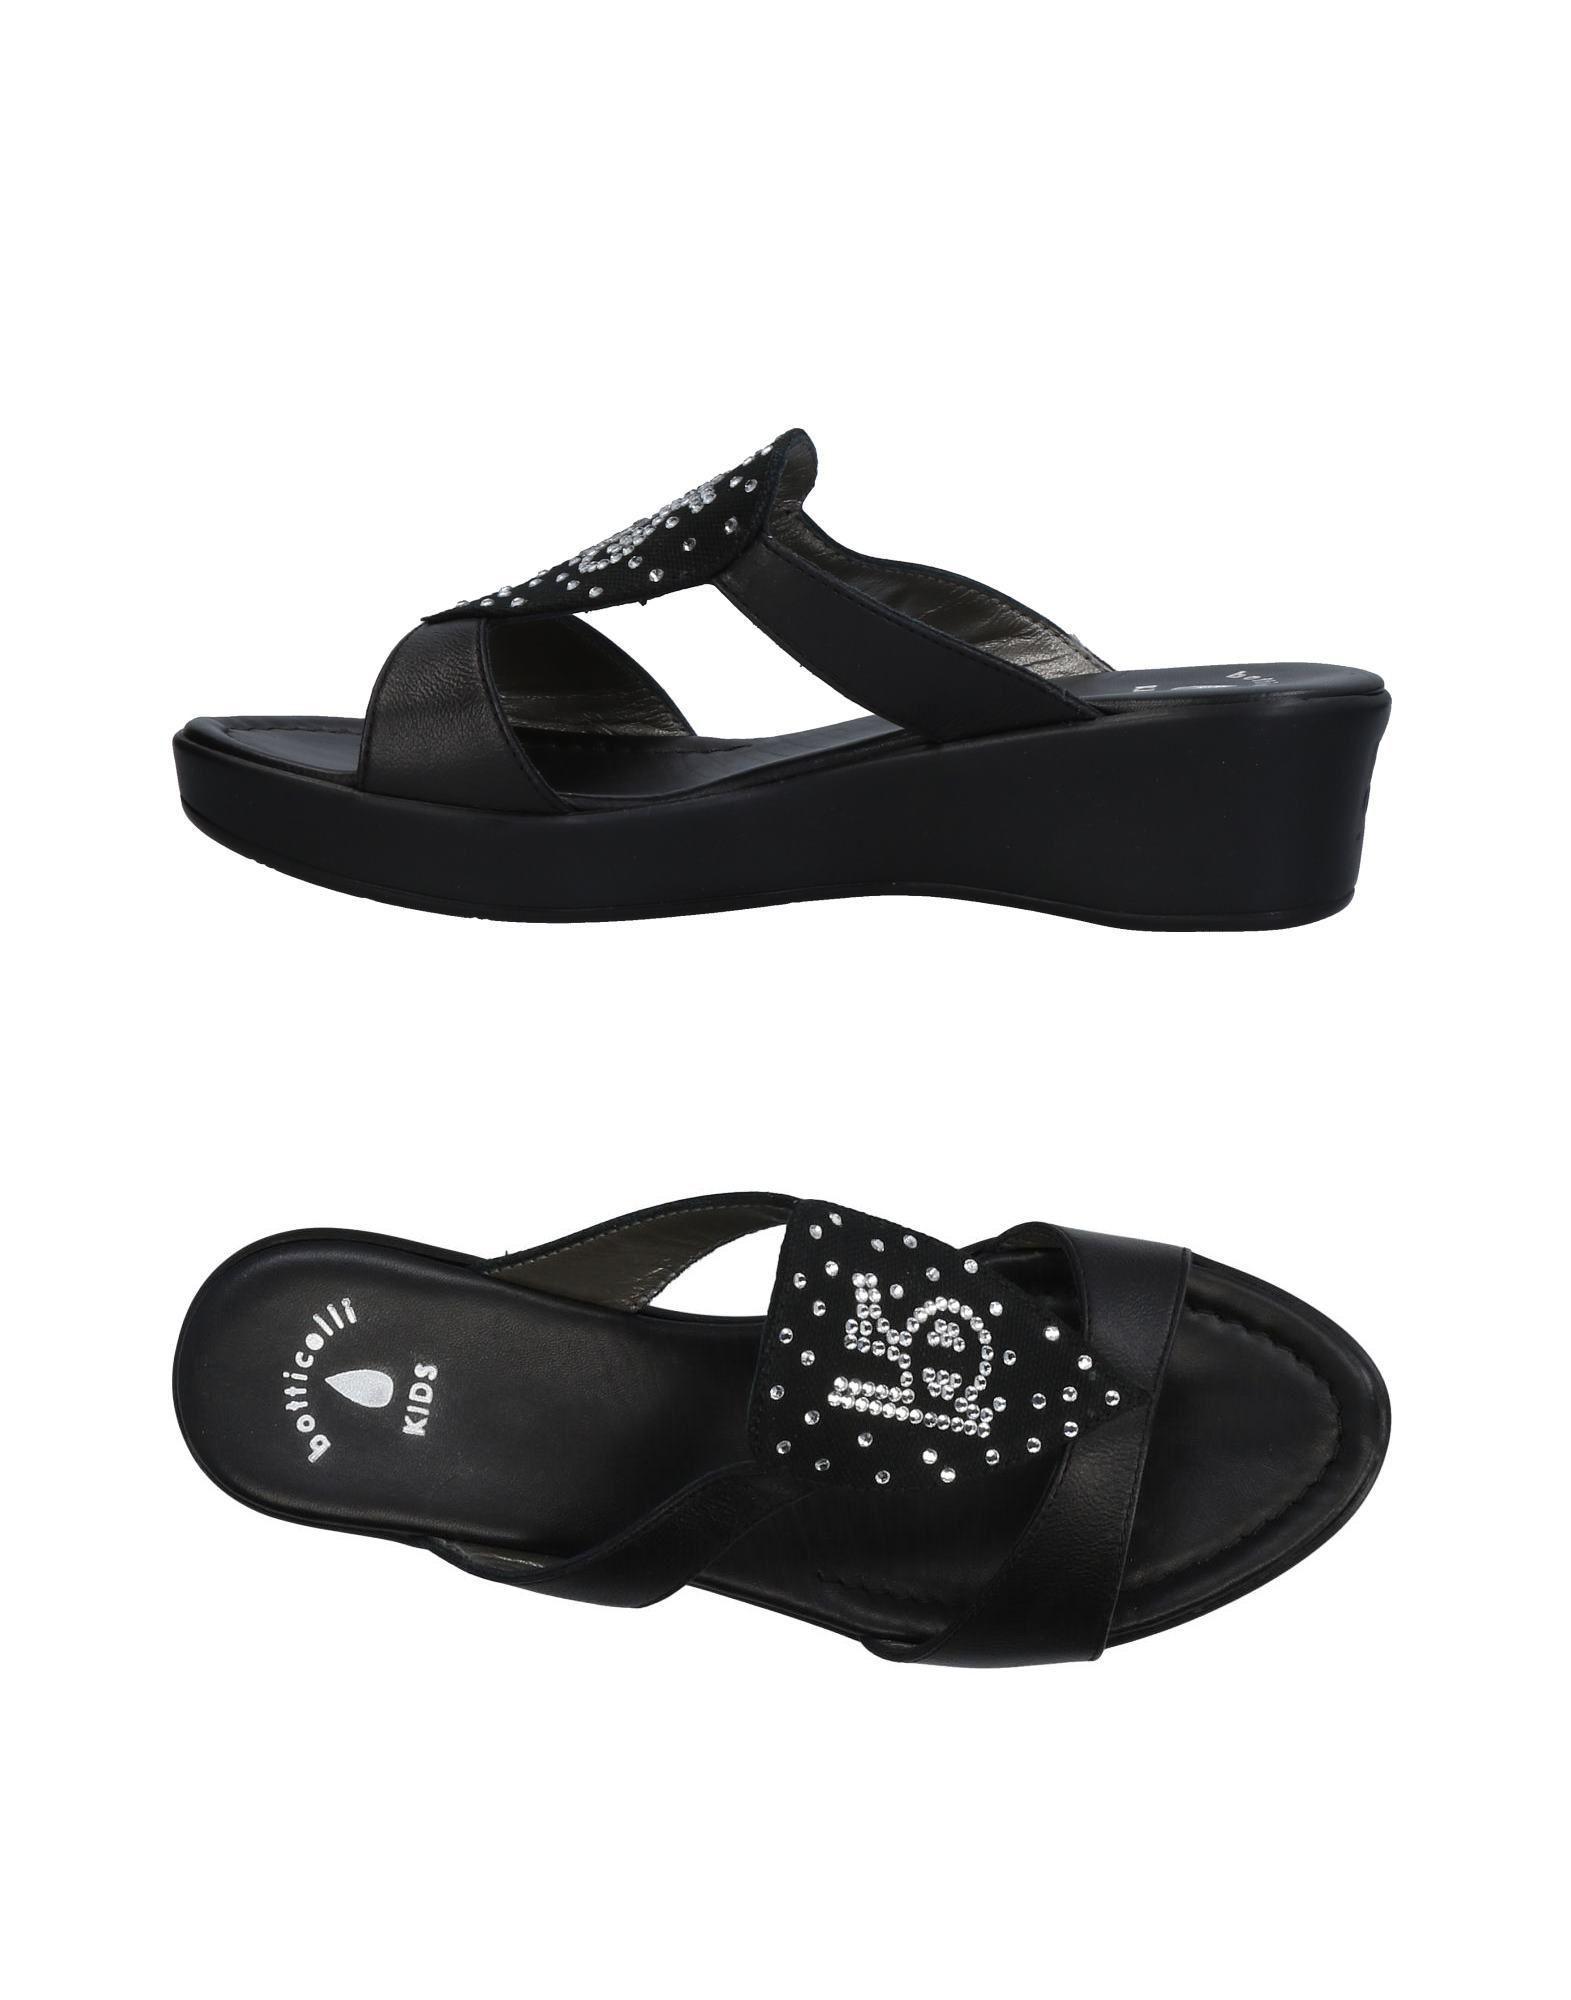 FOOTWEAR - Sandals Botticelli Limited BAt4UELZE